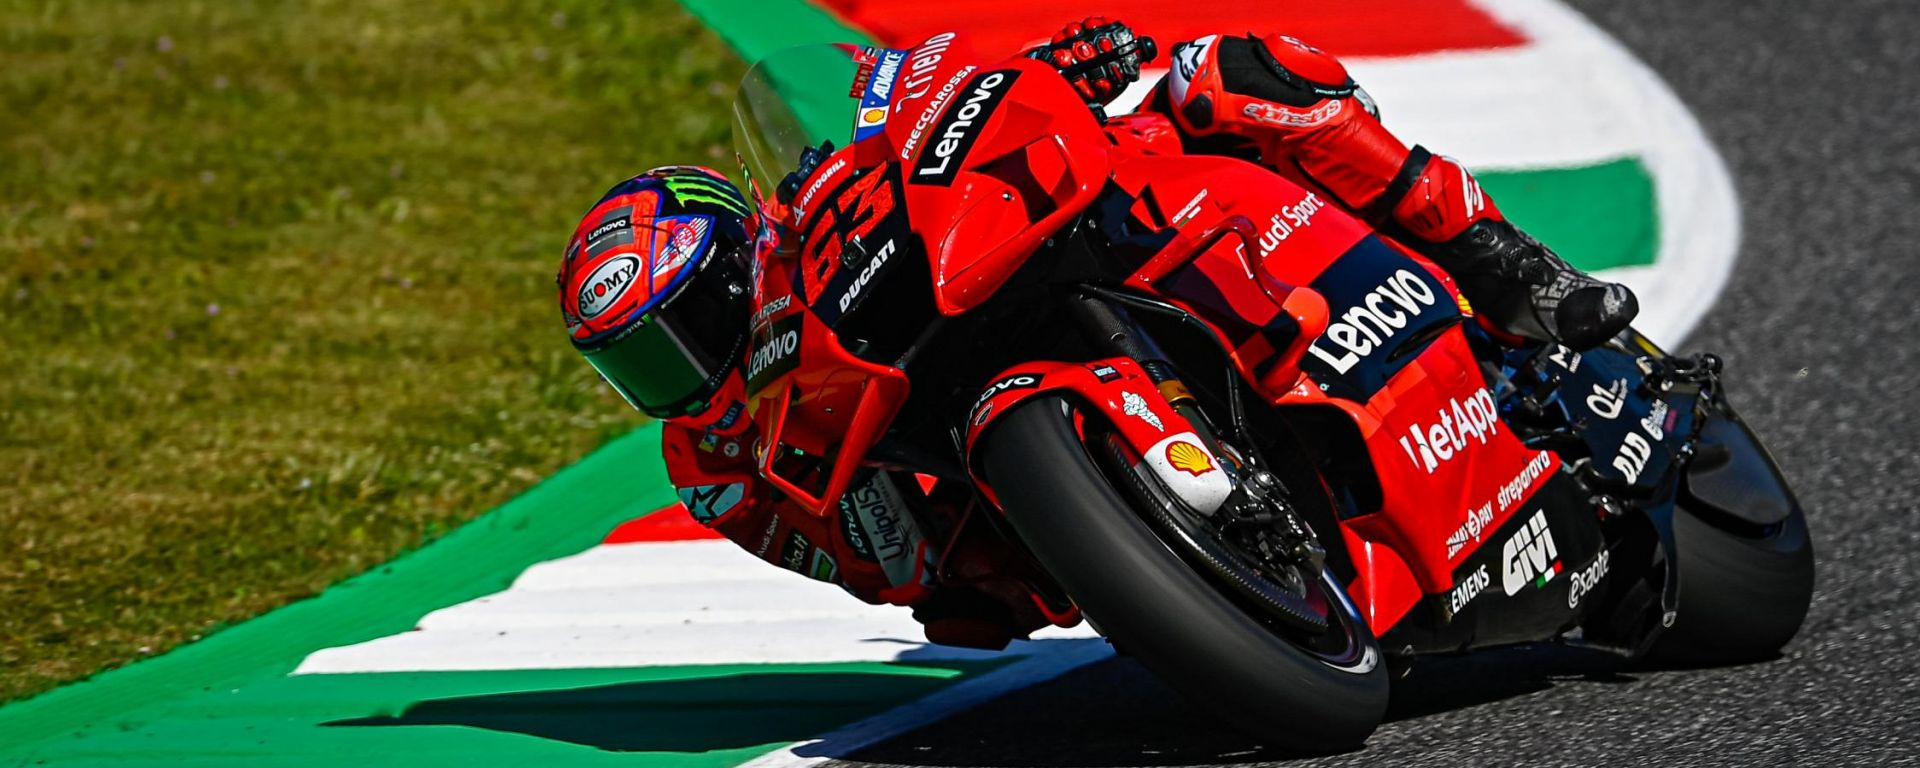 MotoGP Italia 2021, Mugello: Francesco Bagnaia (Ducati)